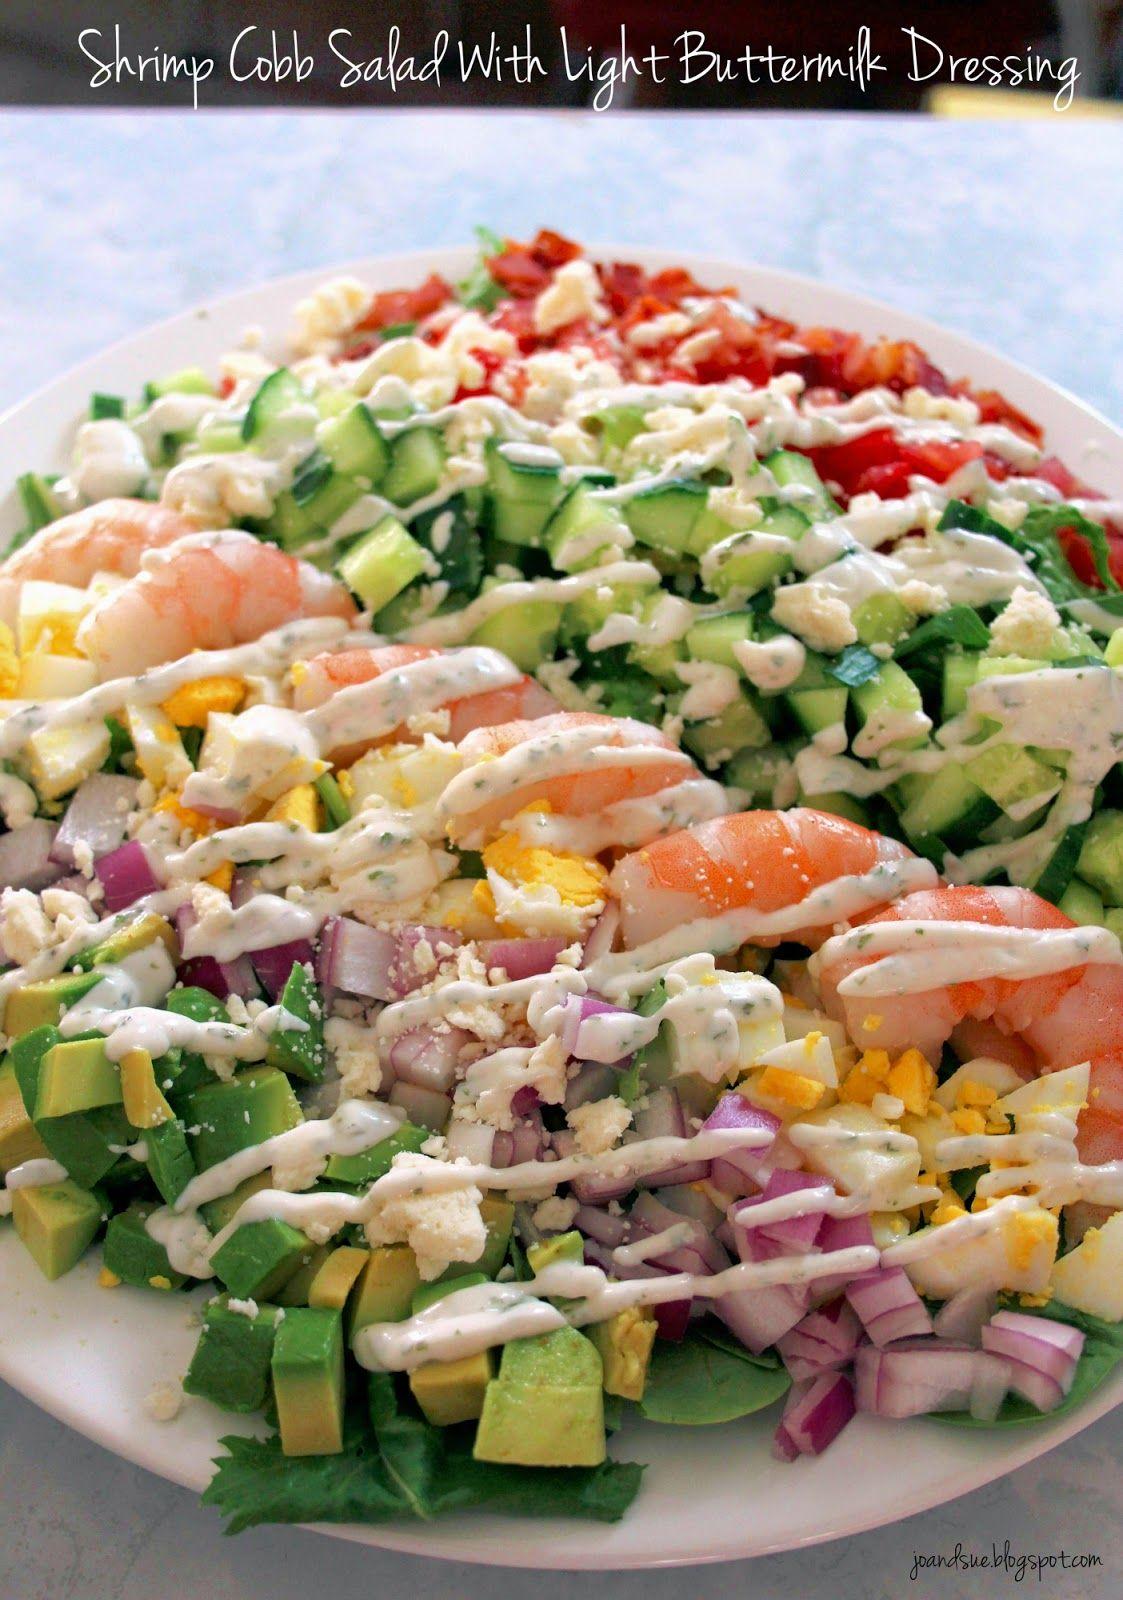 Jo And Sue Shrimp Cobb Salad With Light Buttermilk Dressing Homemade Sauce Recipes Chef Salad Recipes Delicious Salads